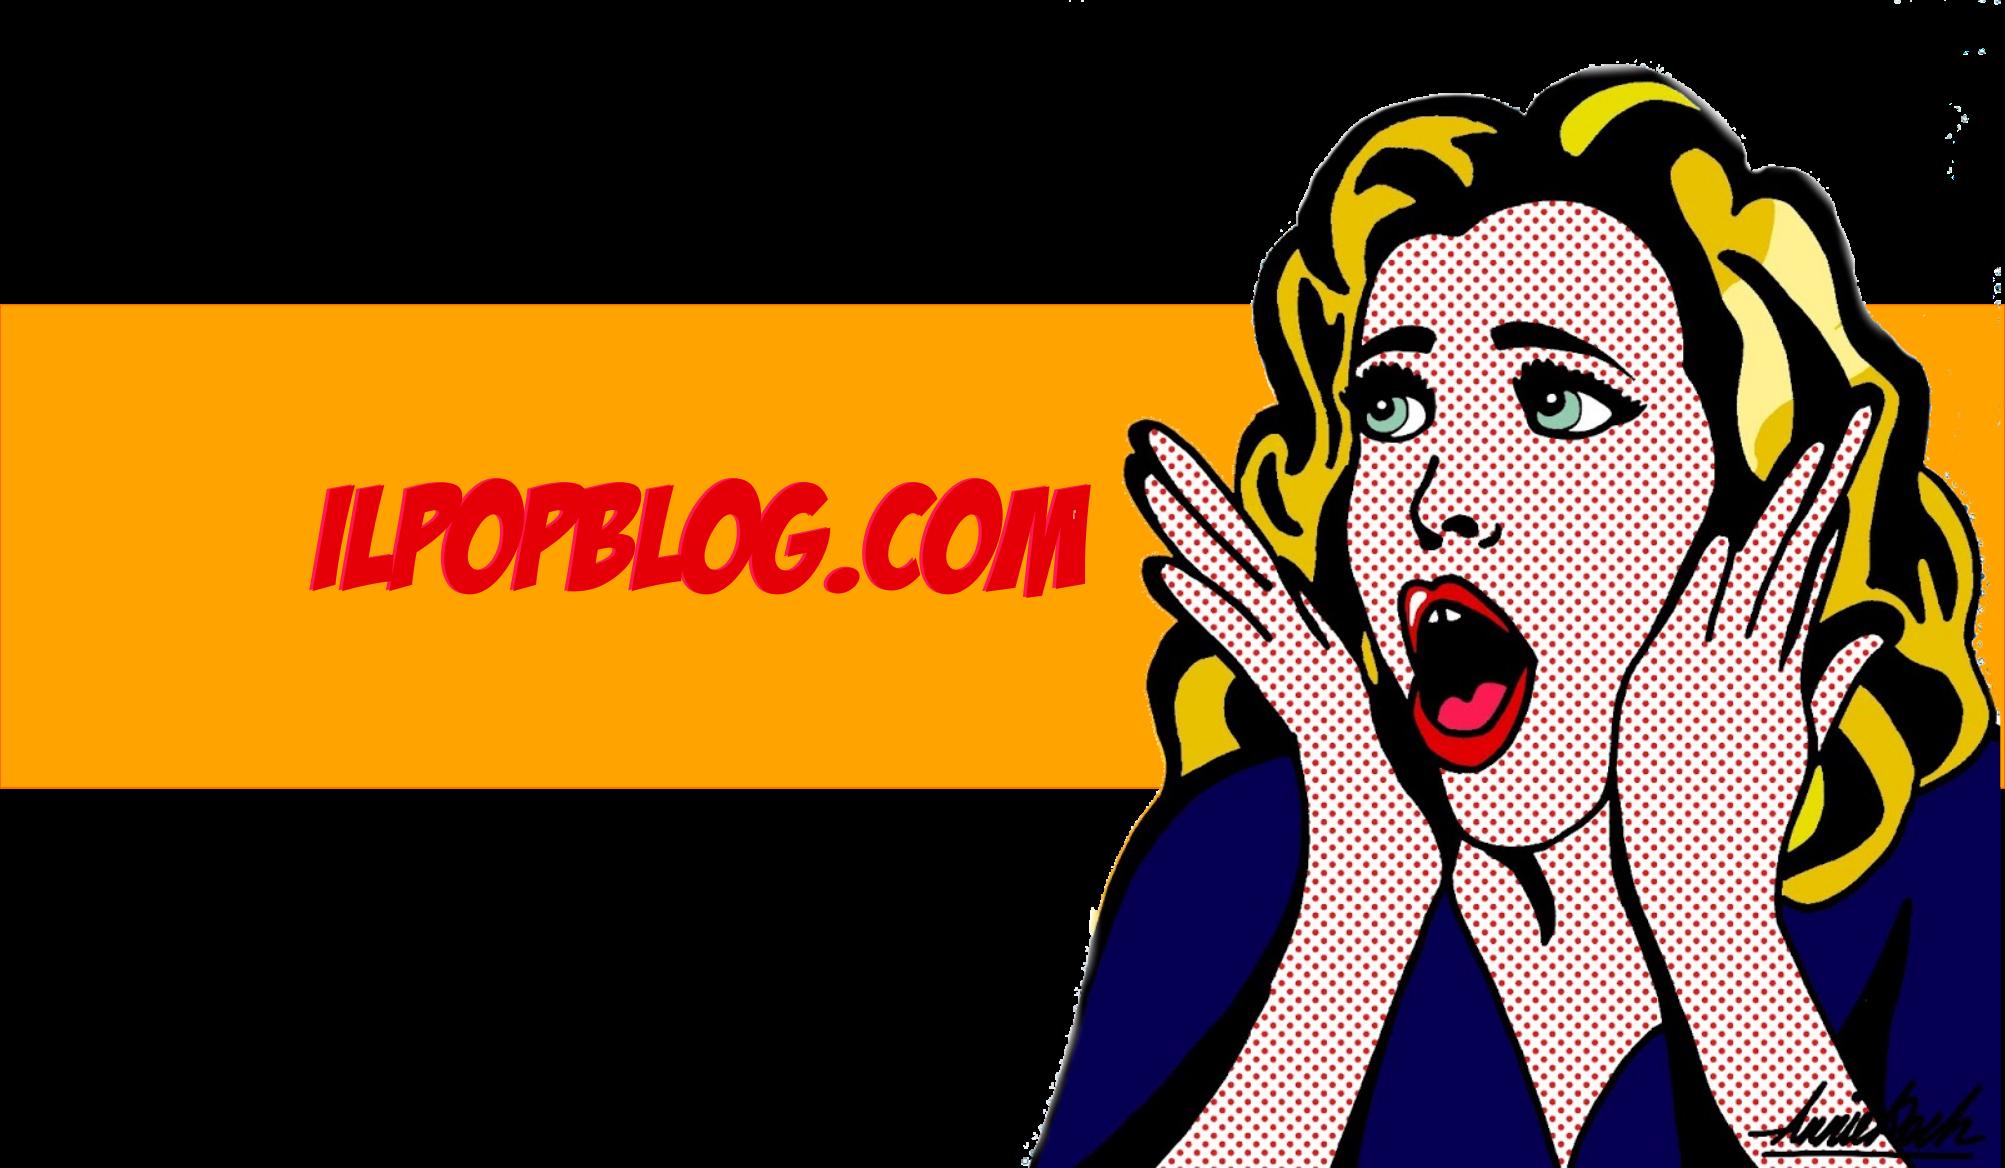 IlPopBlog